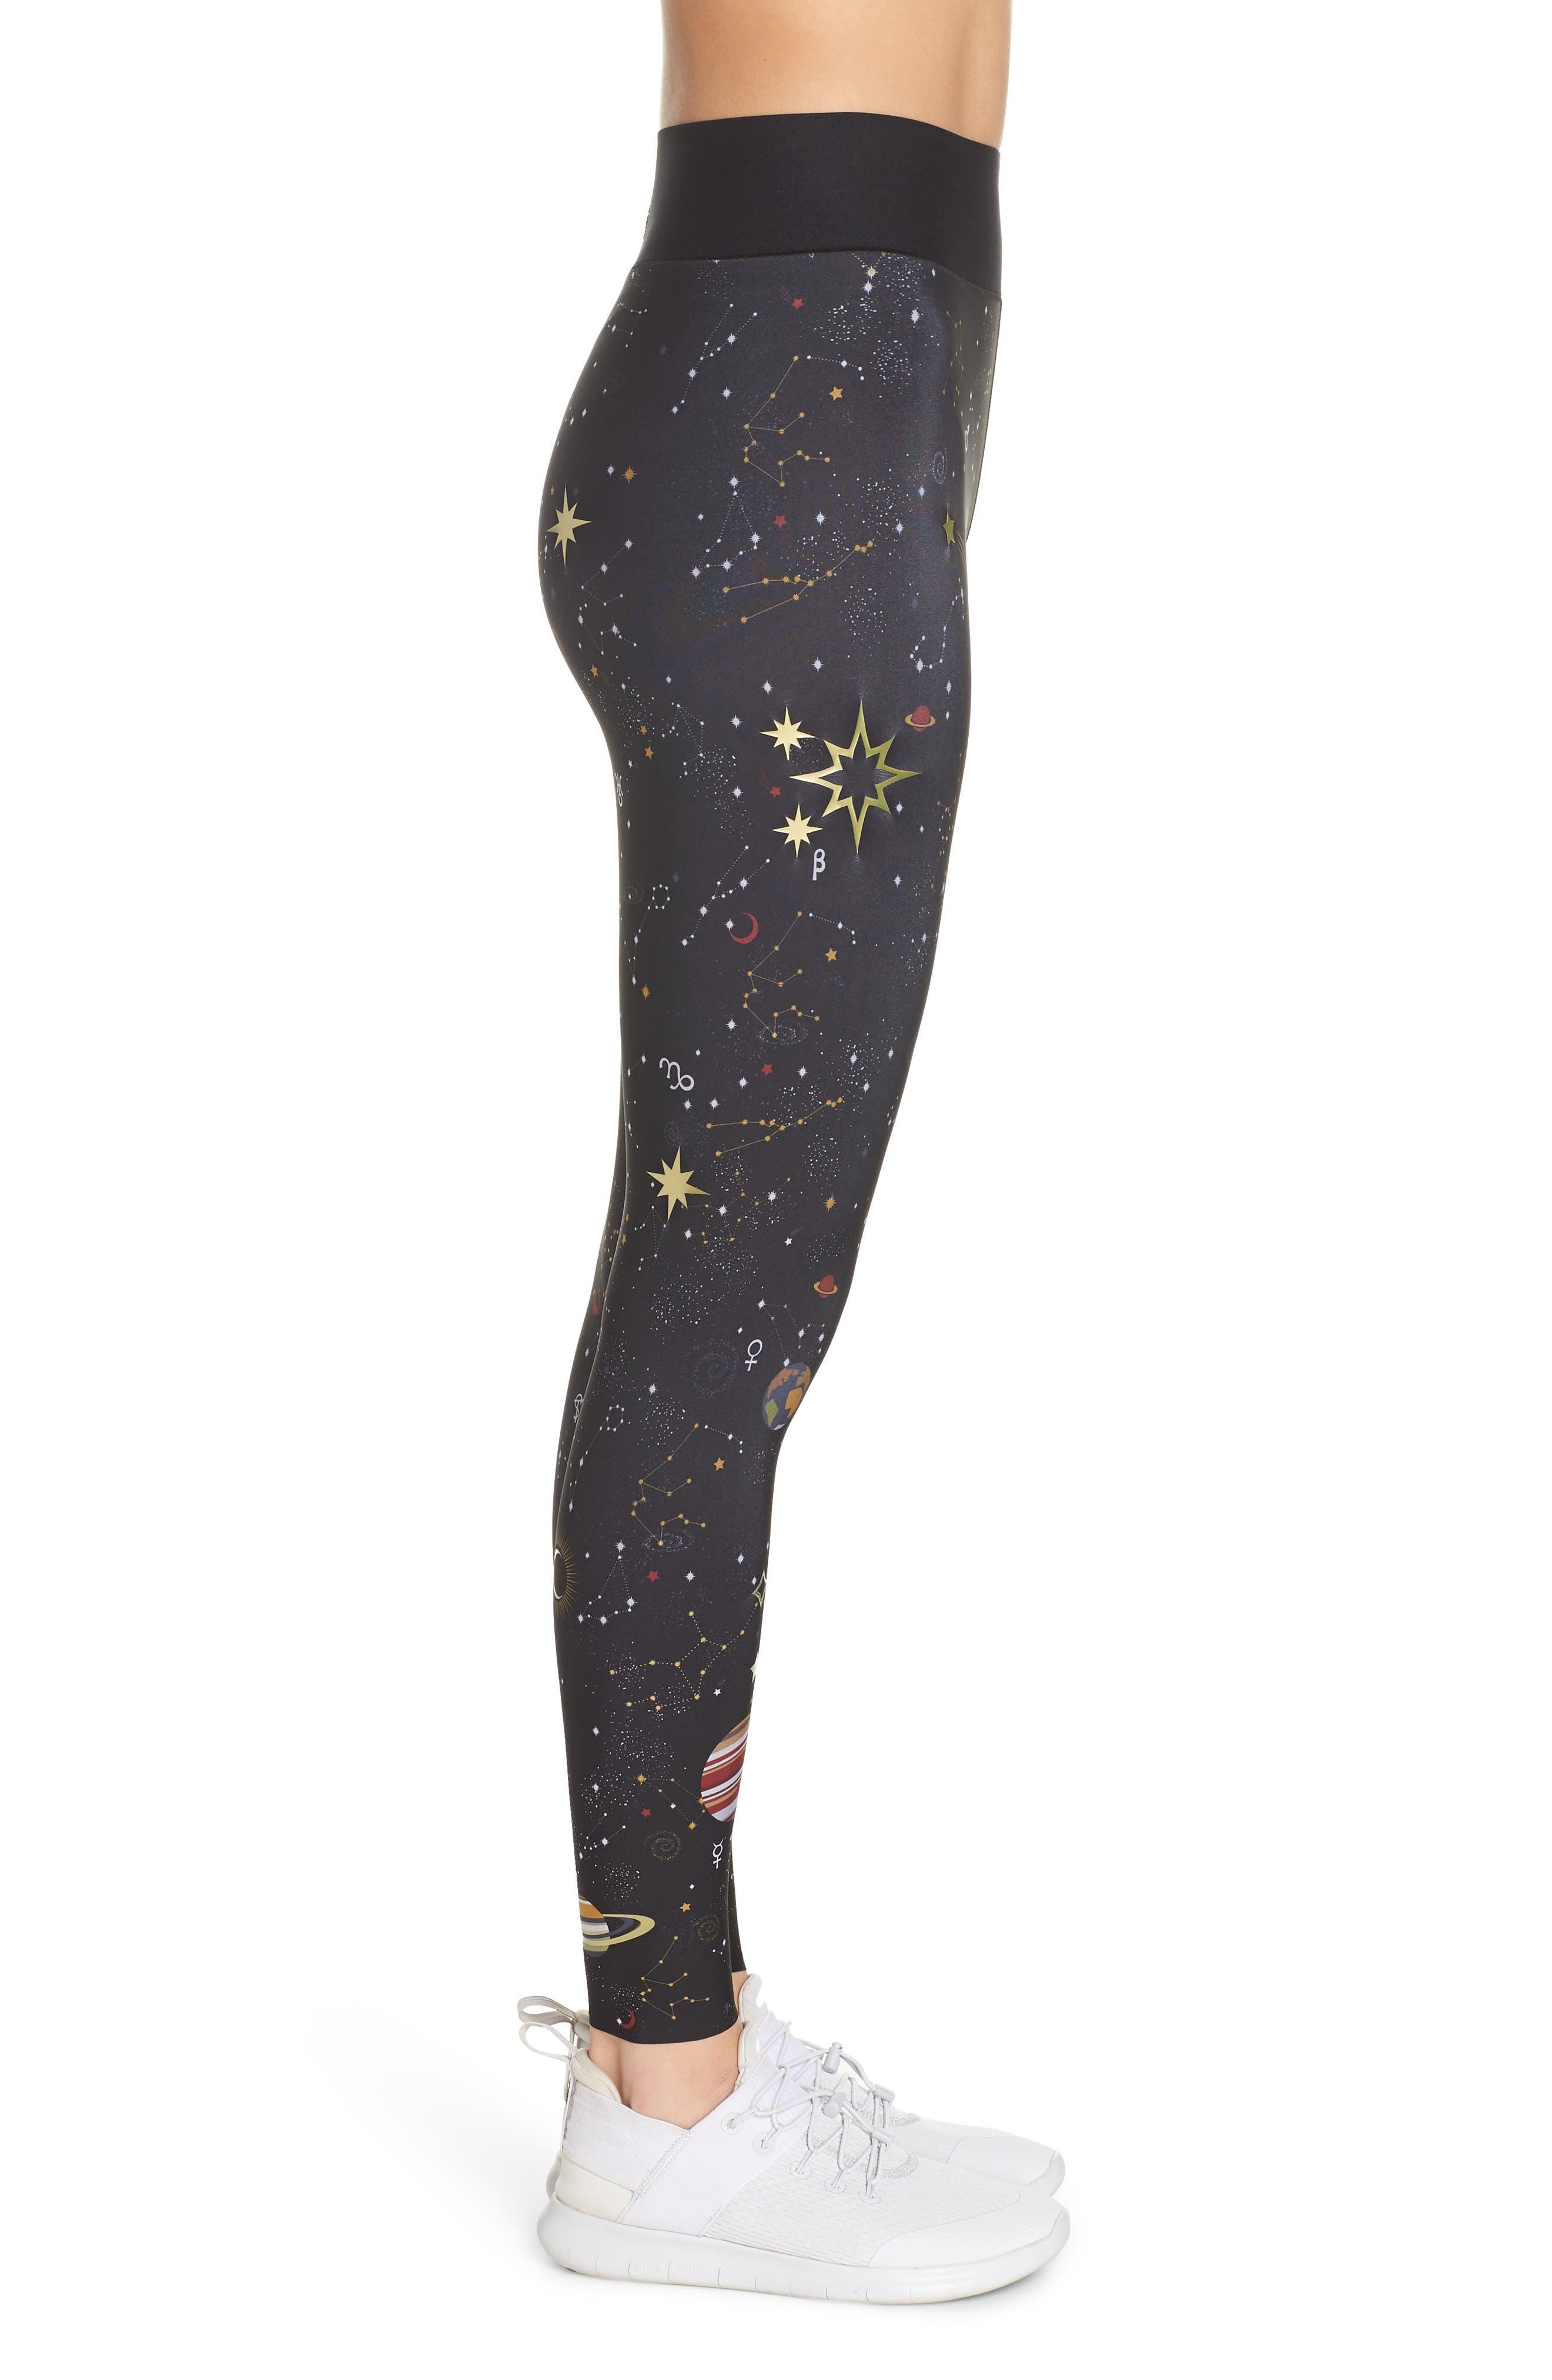 Ultra High Galaxy Leggings,                             Alternate thumbnail 3, color,                             001